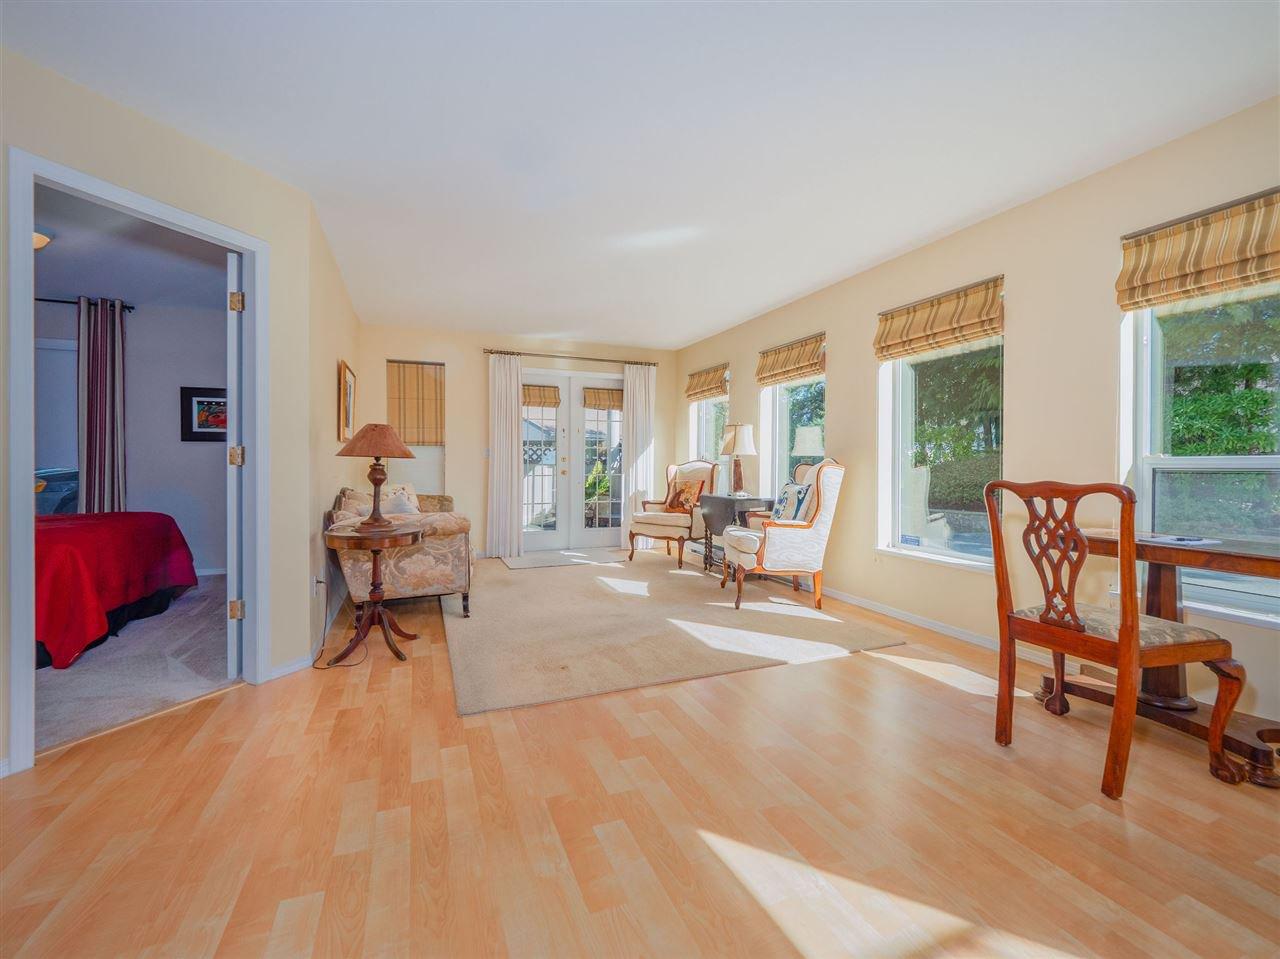 "Photo 4: Photos: 105 5768 MARINE Way in Sechelt: Sechelt District Condo for sale in ""Cypress Ridge"" (Sunshine Coast)  : MLS®# R2446337"